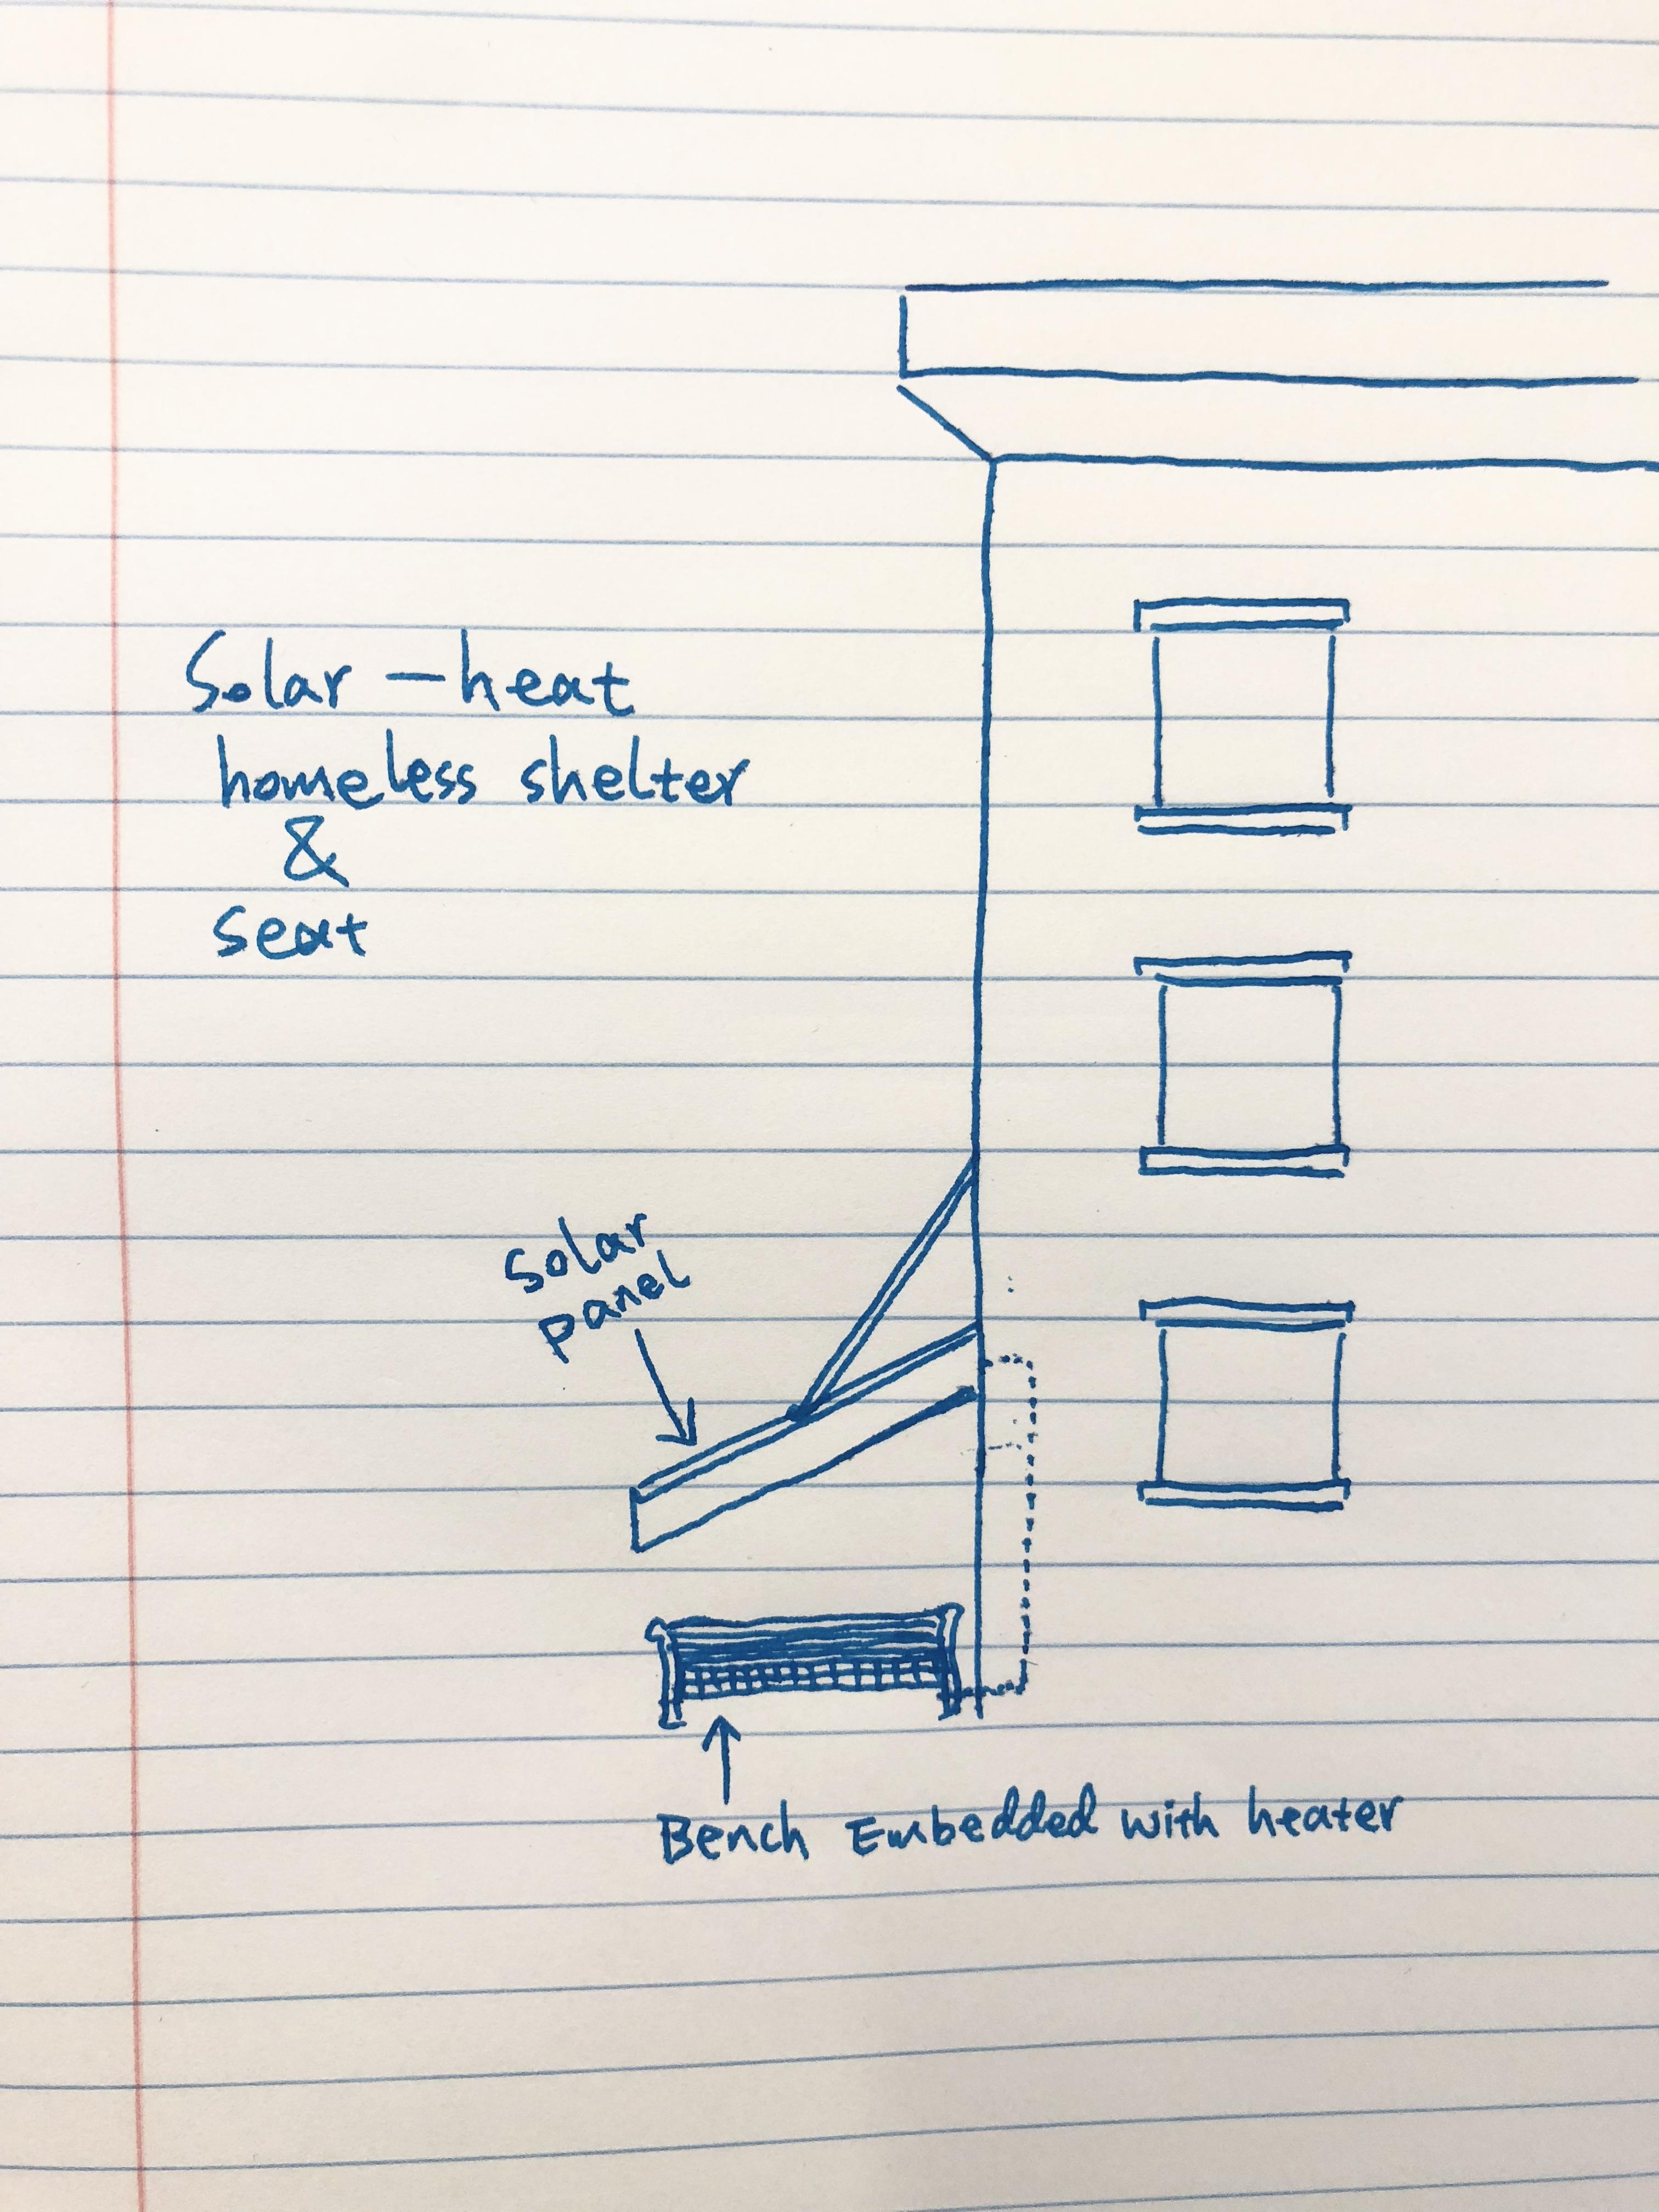 Design Idea #1